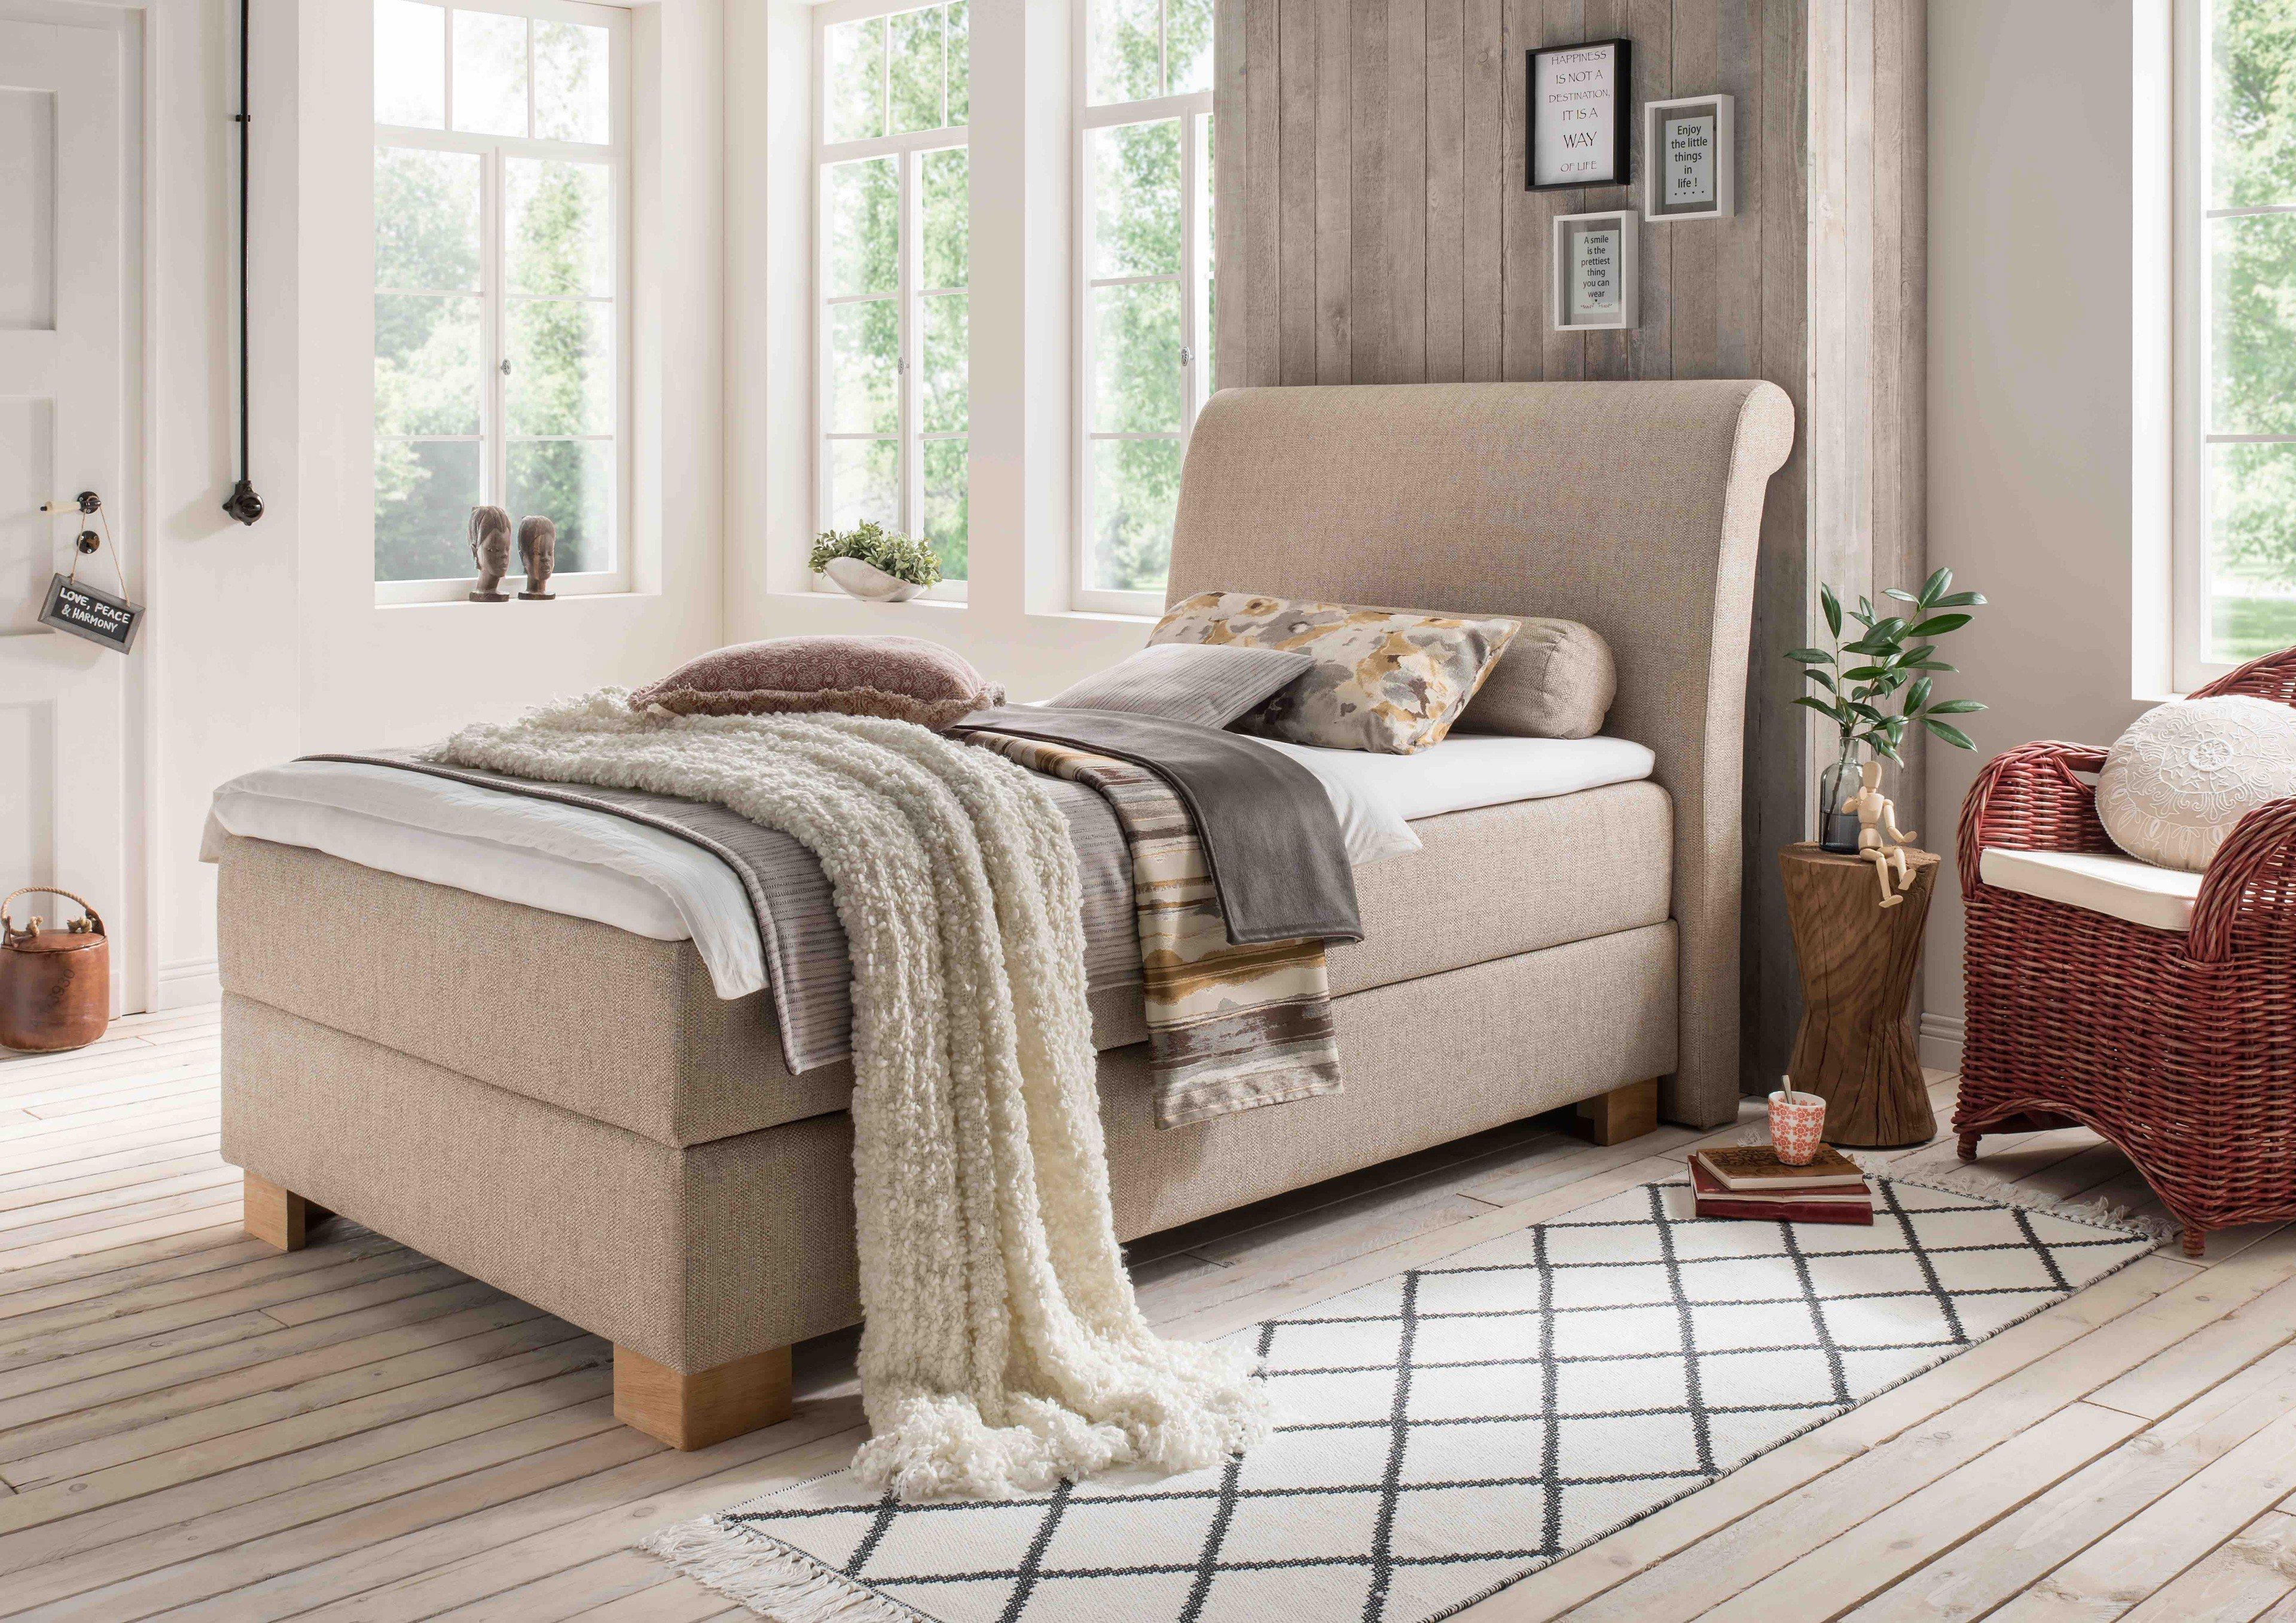 otten boxspringbett princesa mit liegefl che ca 90 x 200. Black Bedroom Furniture Sets. Home Design Ideas